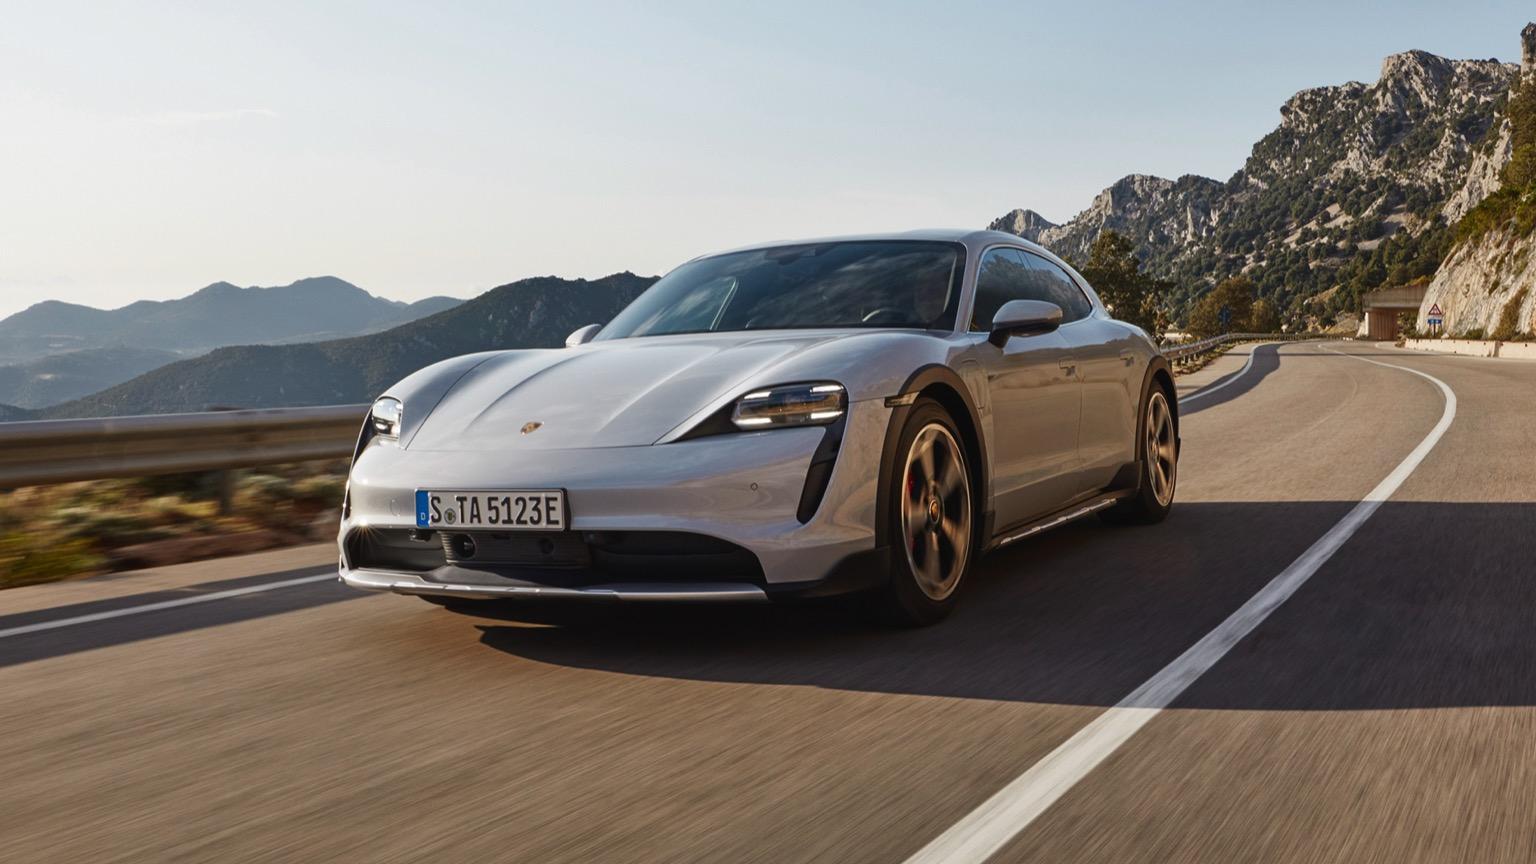 Porsche Taycan 4 Cross Turismo (2021)